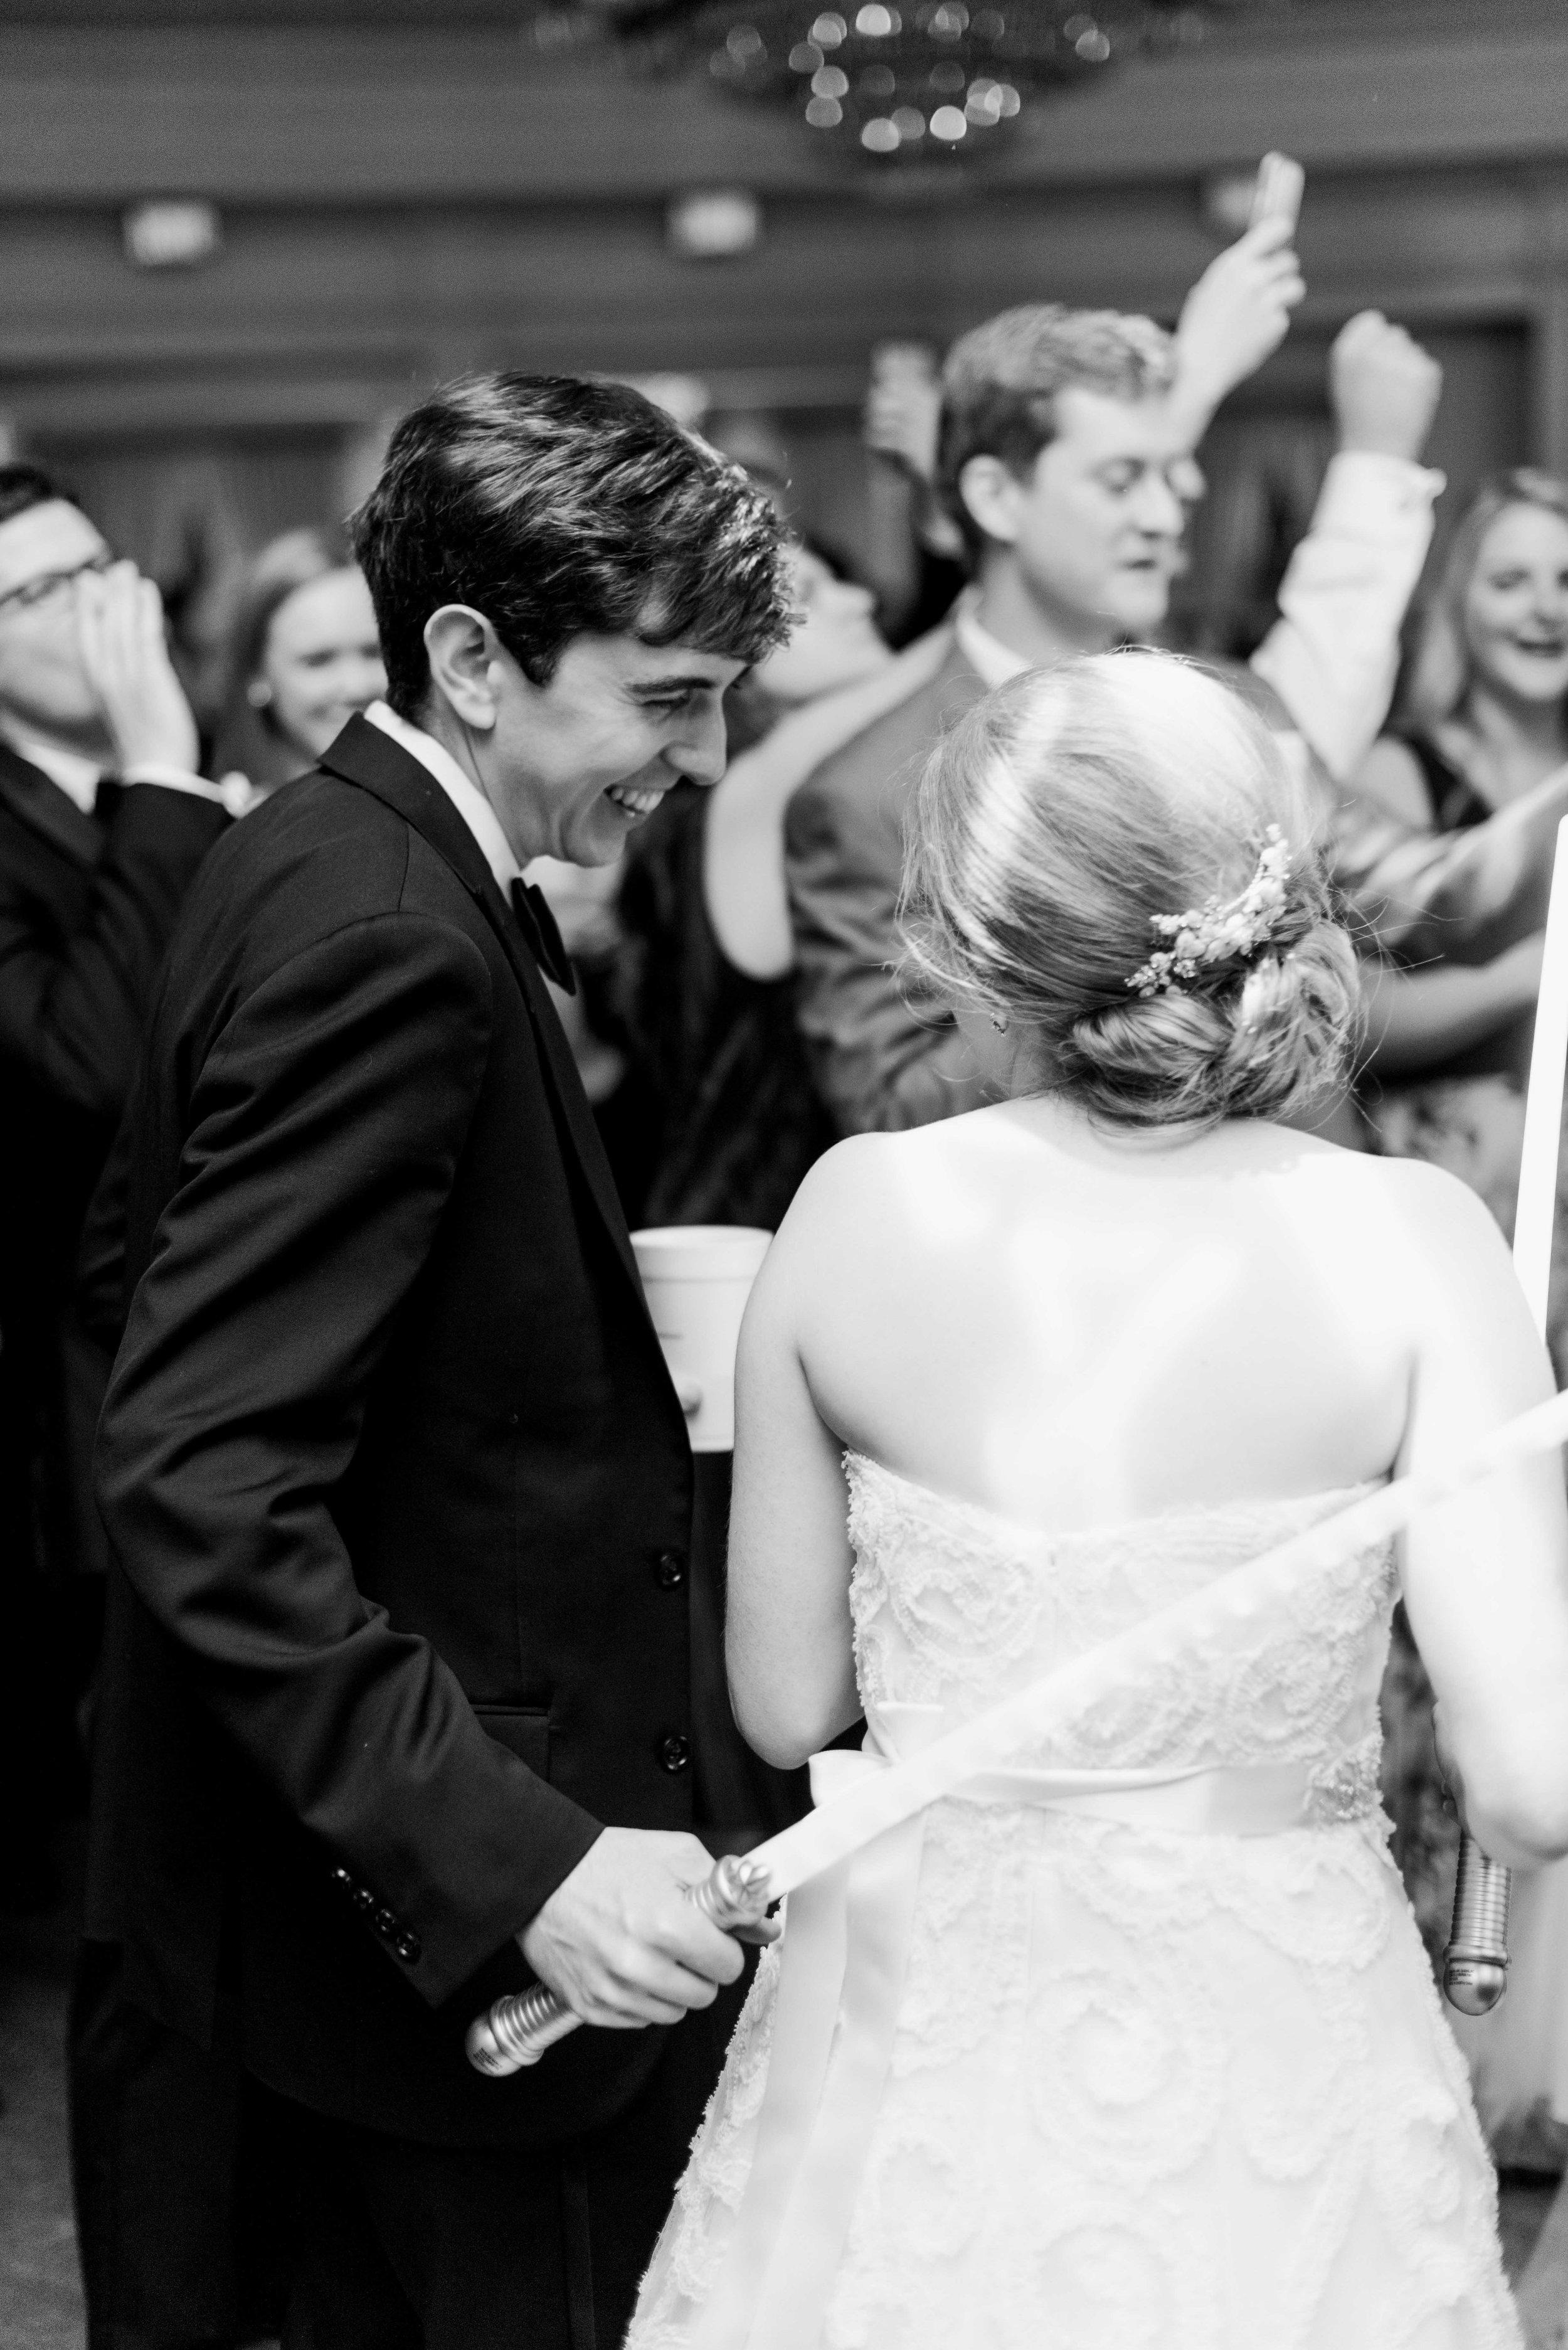 Fine-Art-Film-Houston-Wedding-Photographer-Best-Top-Luxury-Texas-Austin-Dallas-Destination-Dana-Fernandez-Photography-River-Oaks-Country-Club-South-Main-Baptist-Ceremony-Reception-Wedding-40.jpg